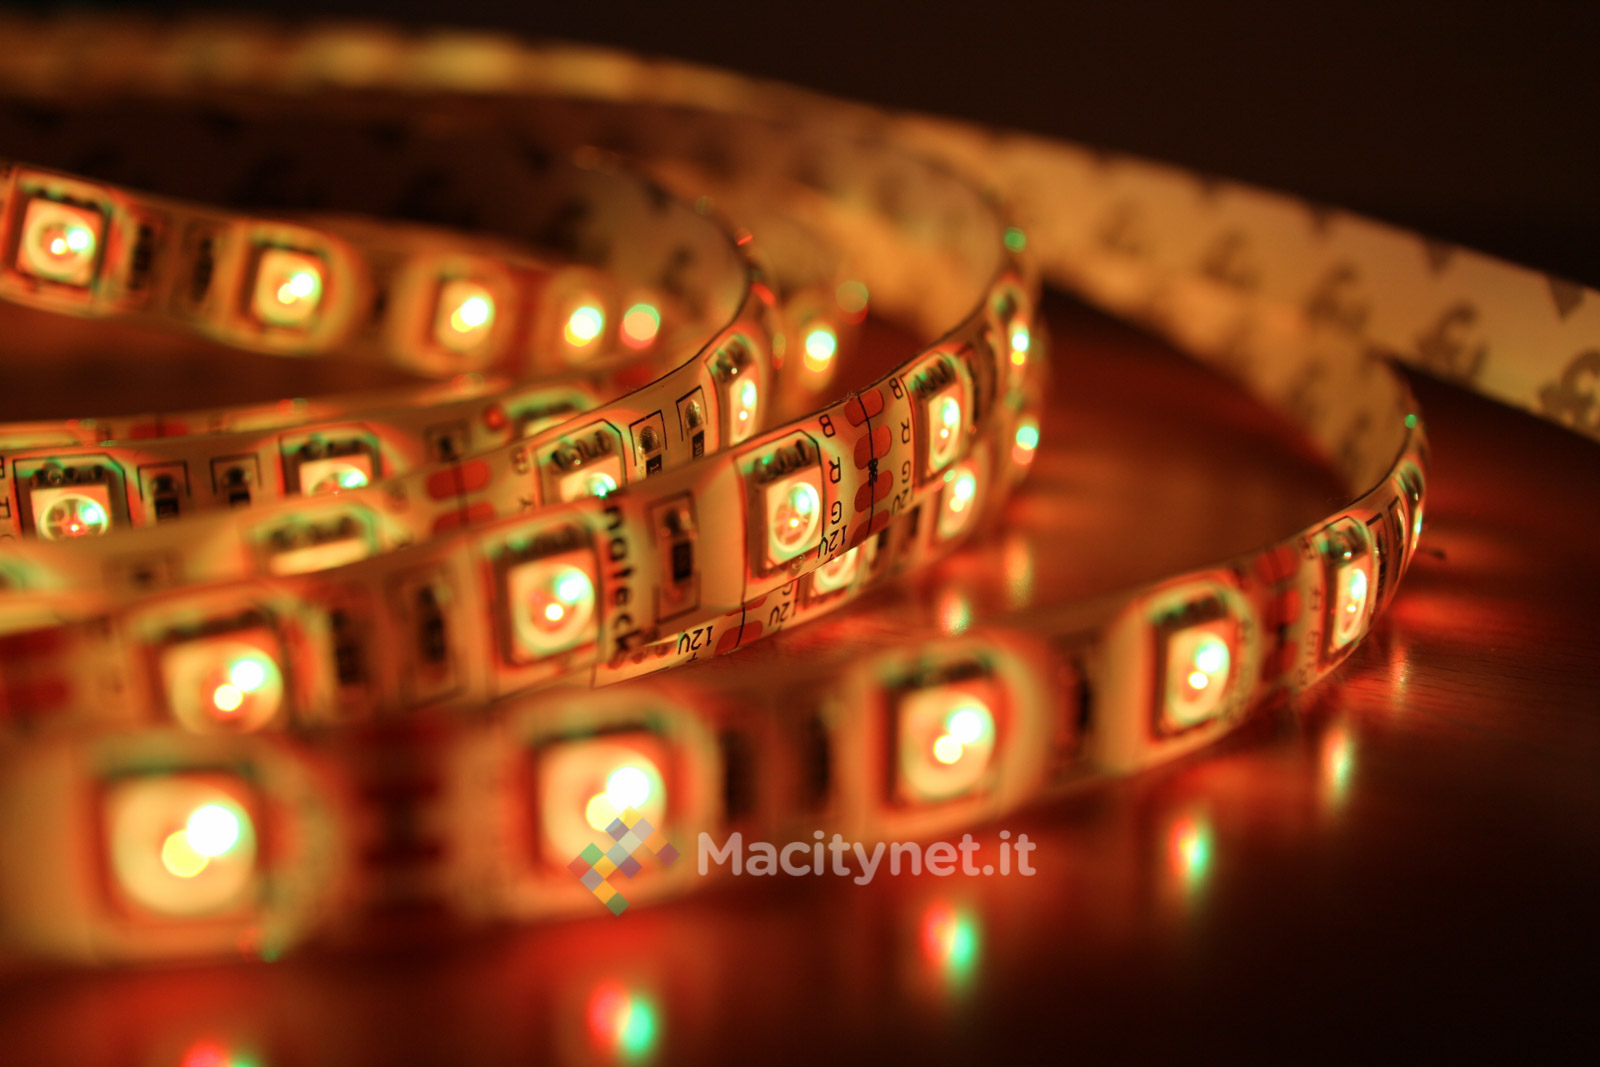 Yuri Di Prodo, Macitynet 2015 - IMG_3091 Luci LED Inateck